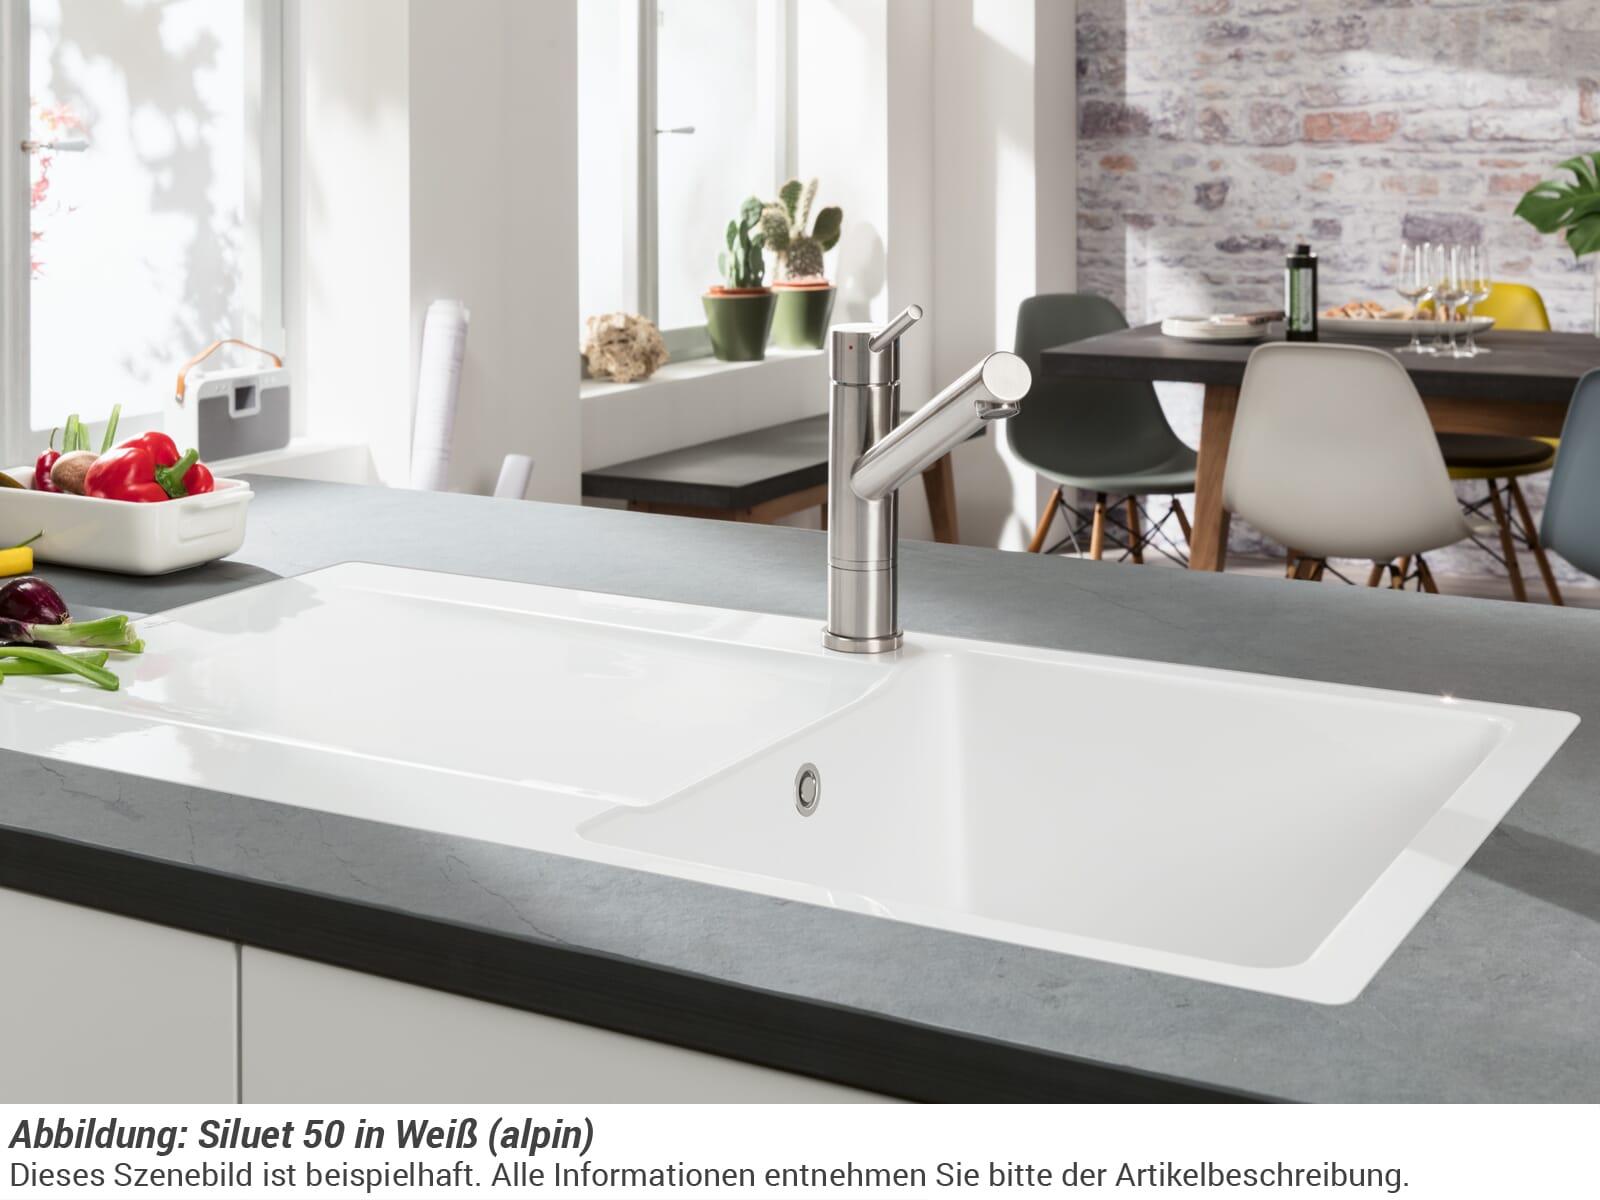 Villeroy & Boch Siluet 50 - 3335 01 AM Almond Keramikspüle Handbetätigung